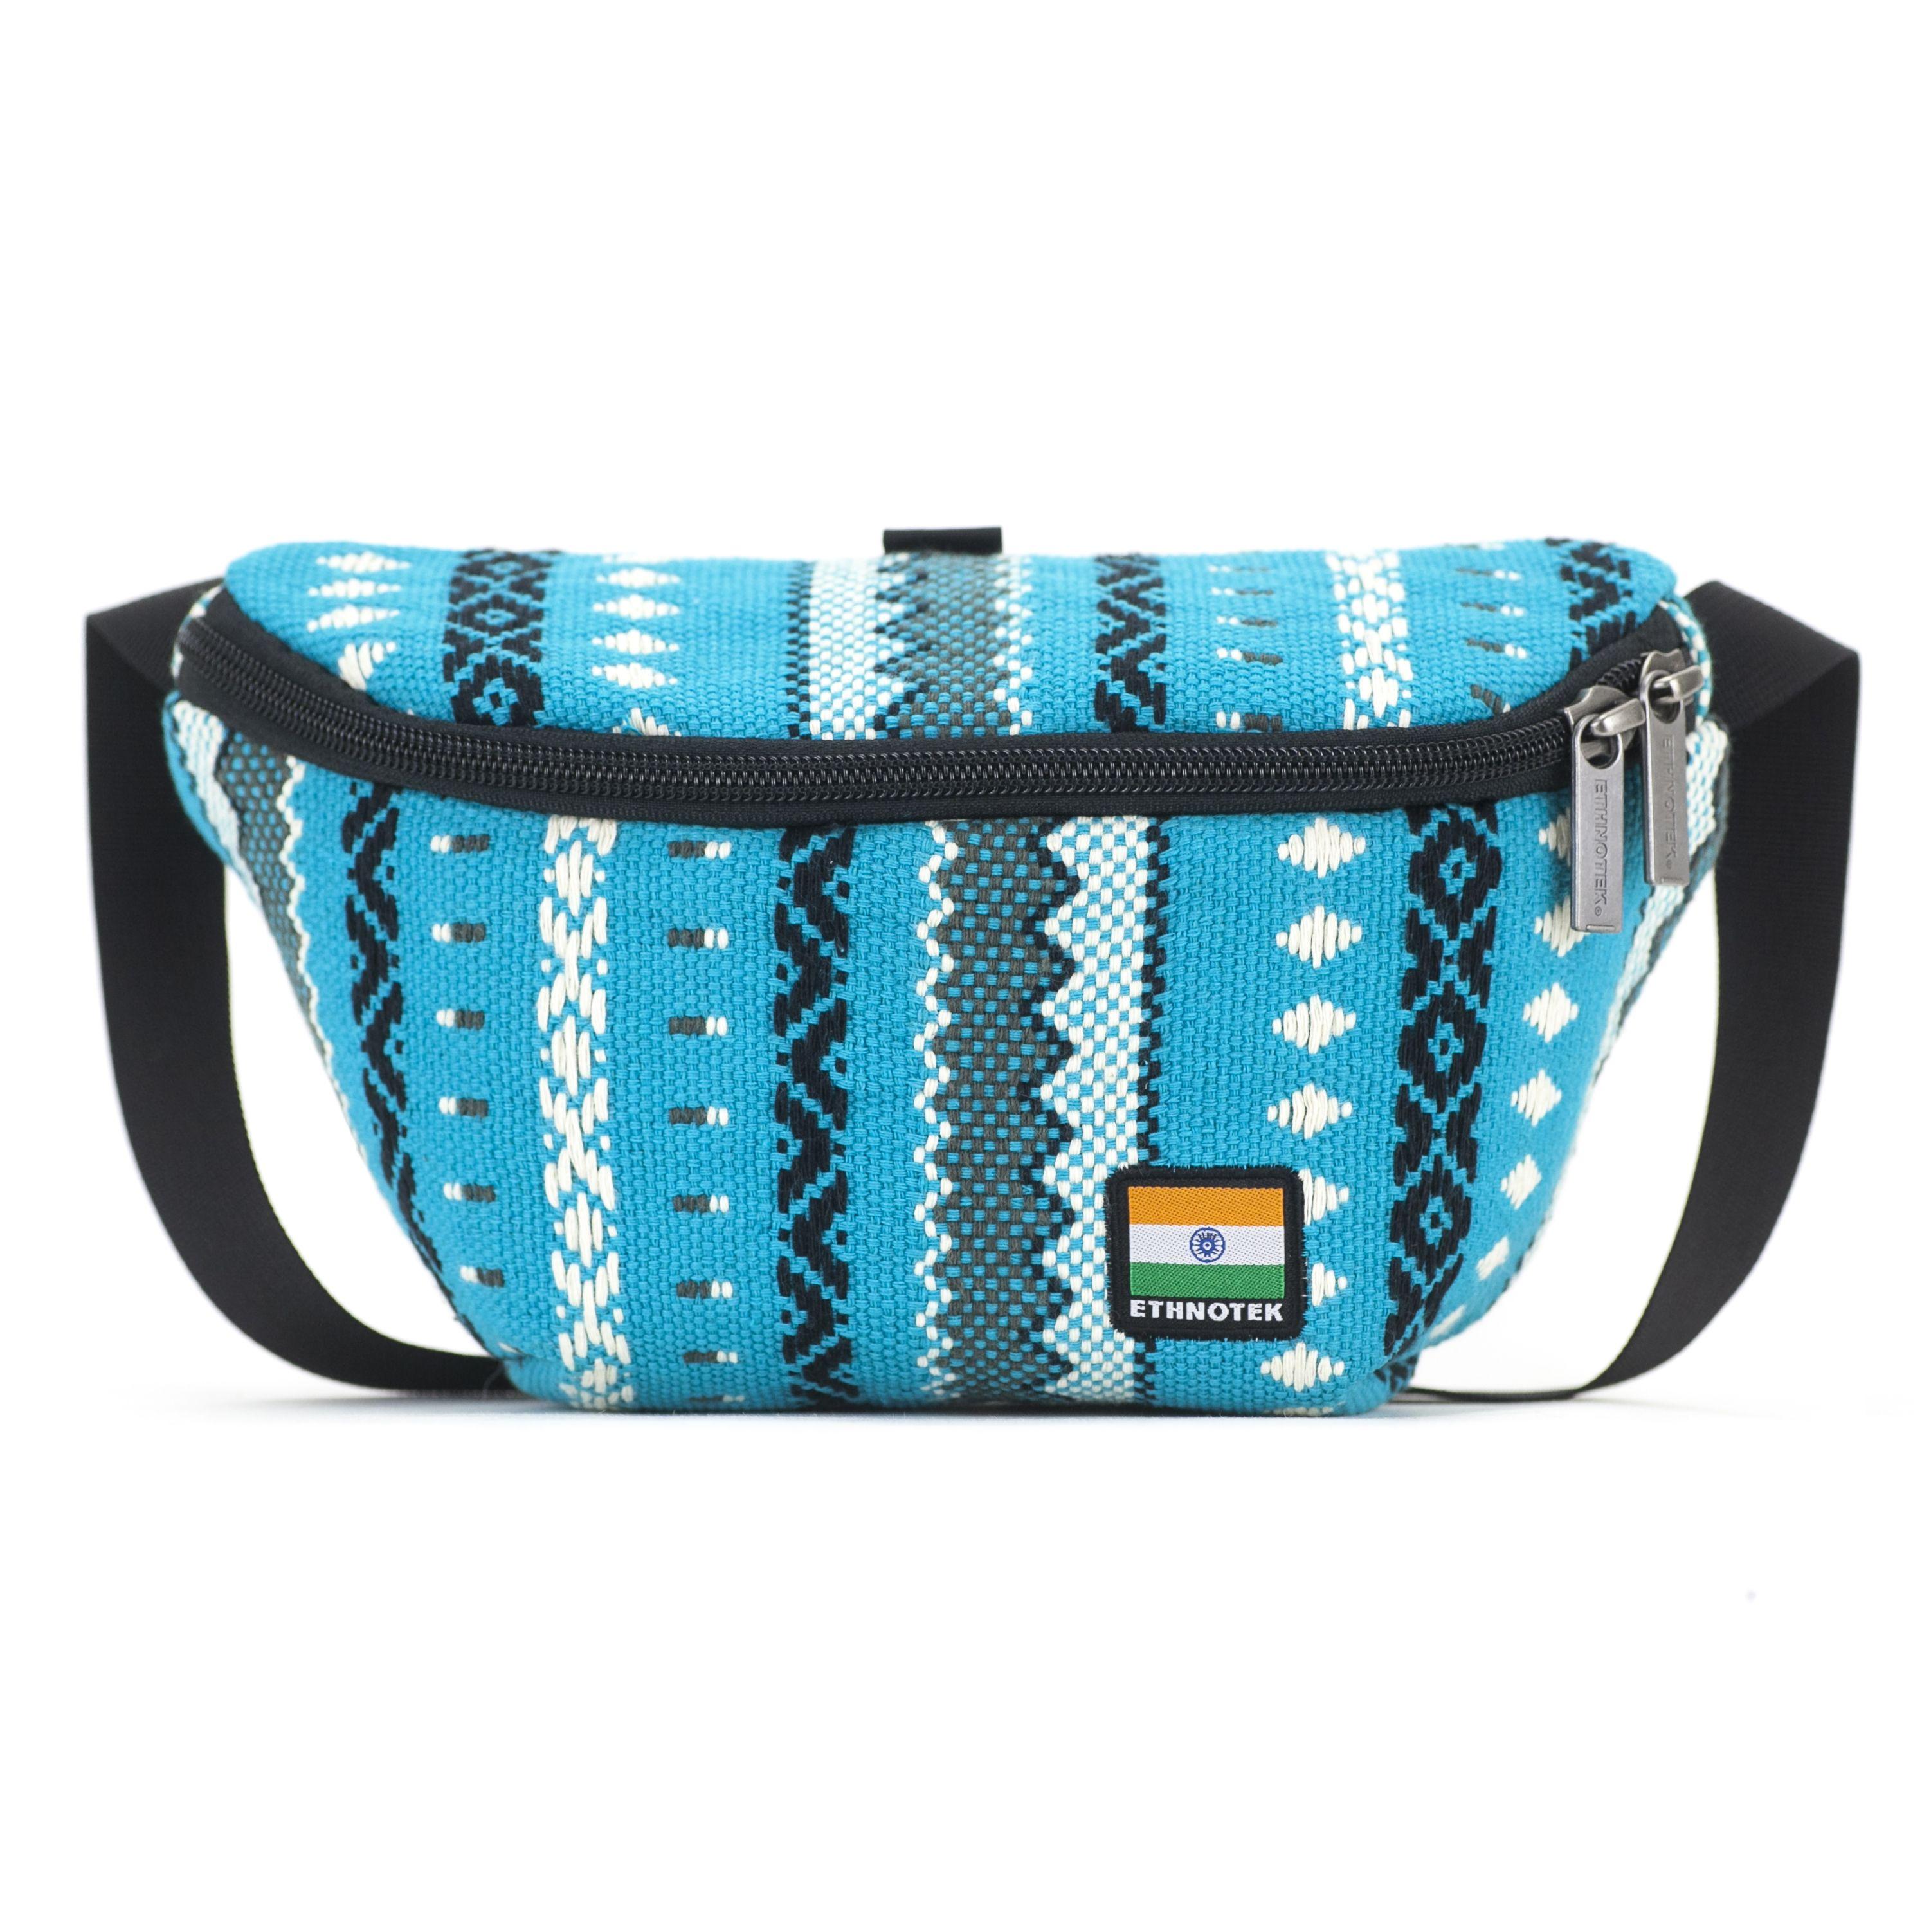 Bagus Bum Bag S Viva con Agua Blue